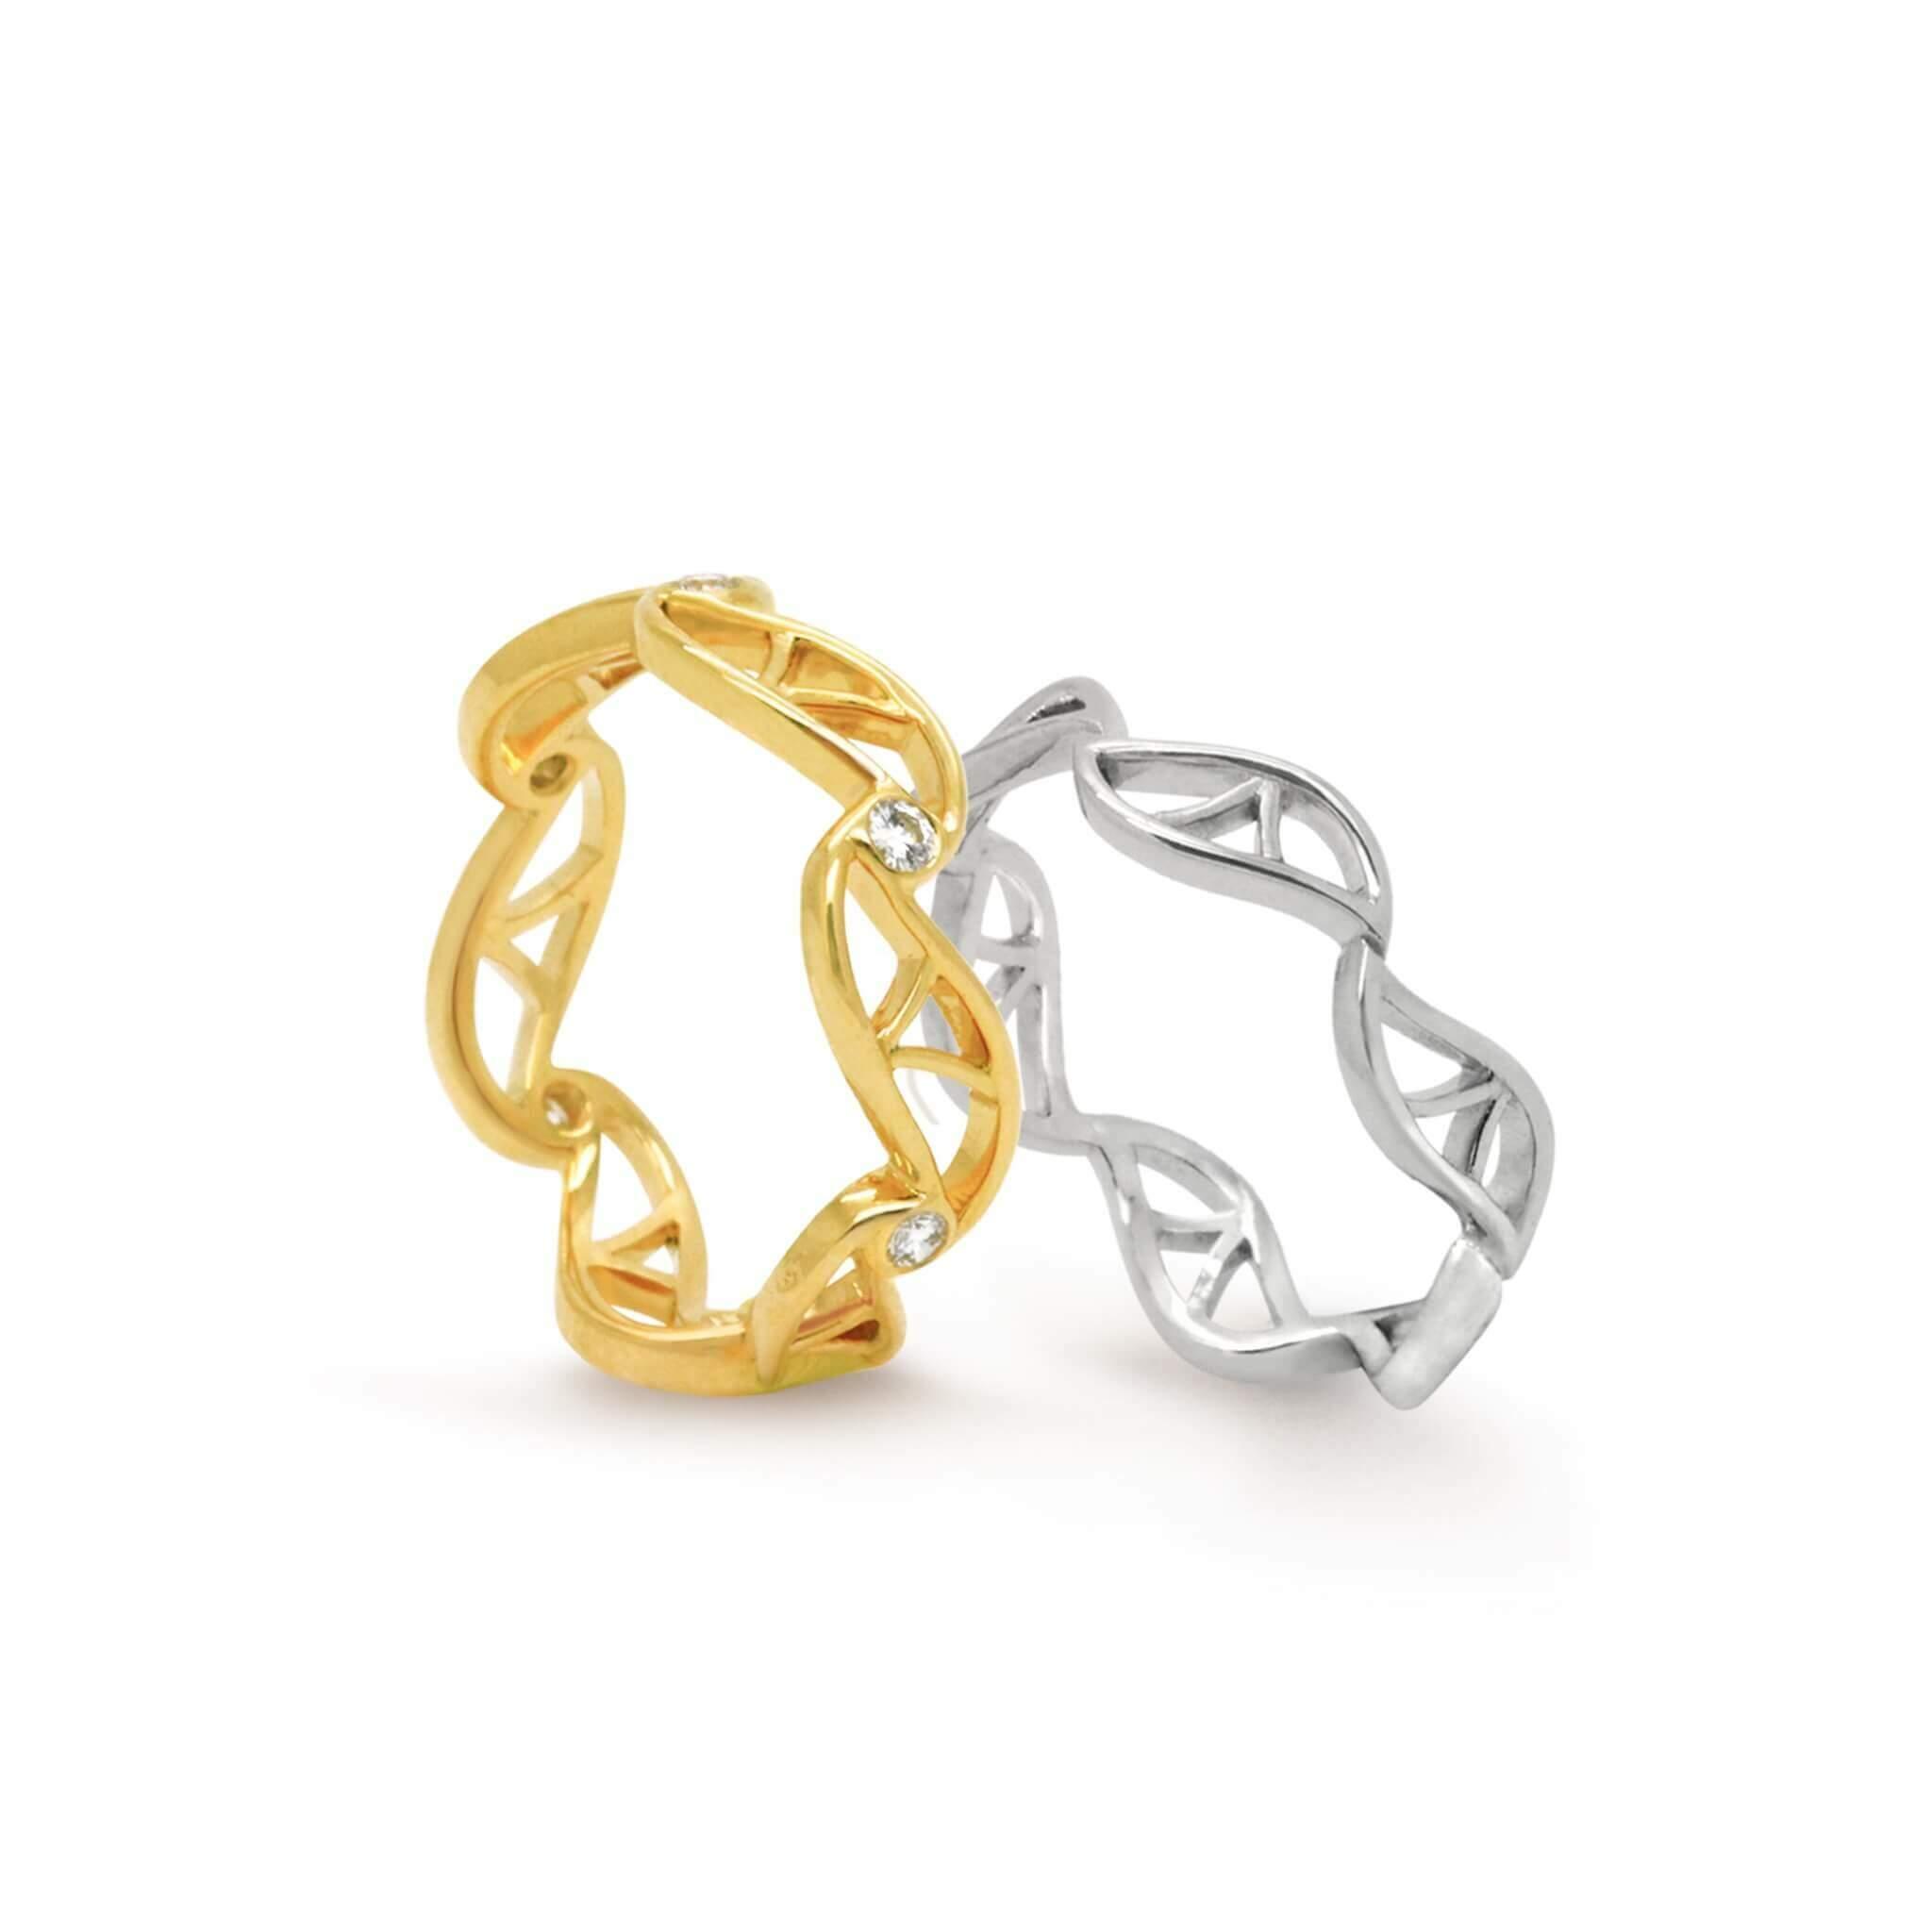 feuille bague alliance en or rose or blanc or jaune et diamants